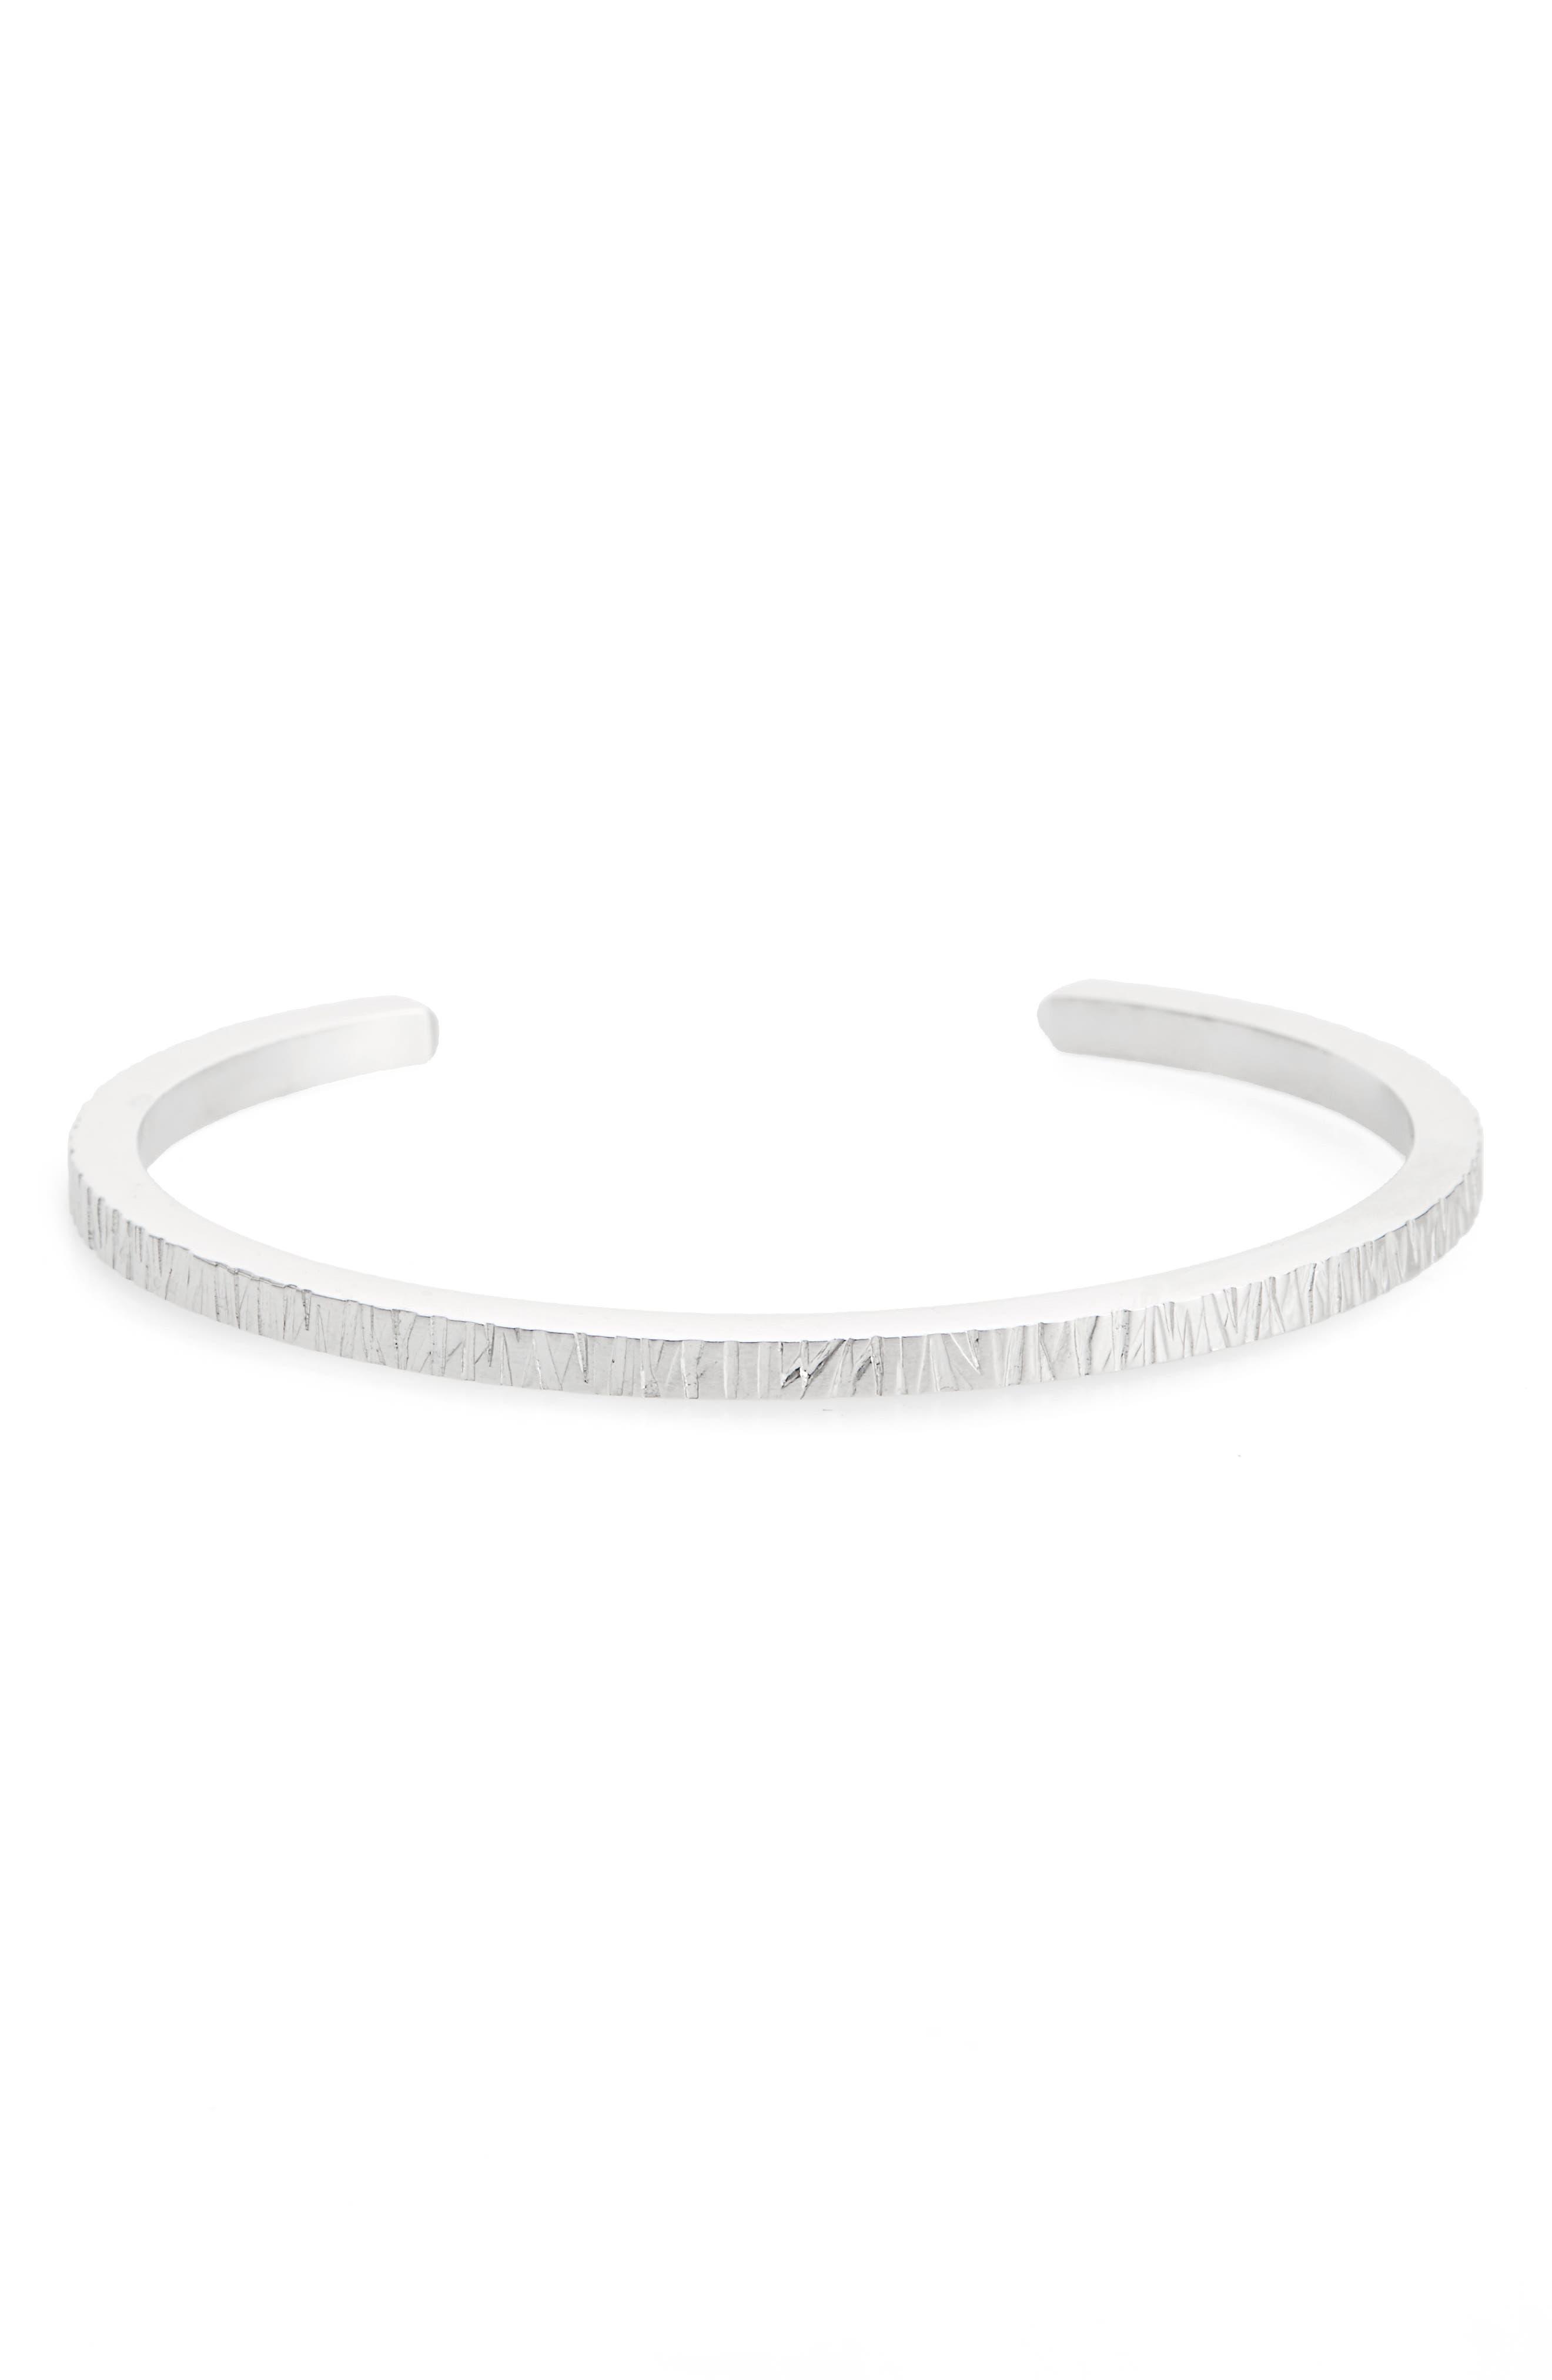 Main Image - Tom Wood Structured Cuff Bracelet